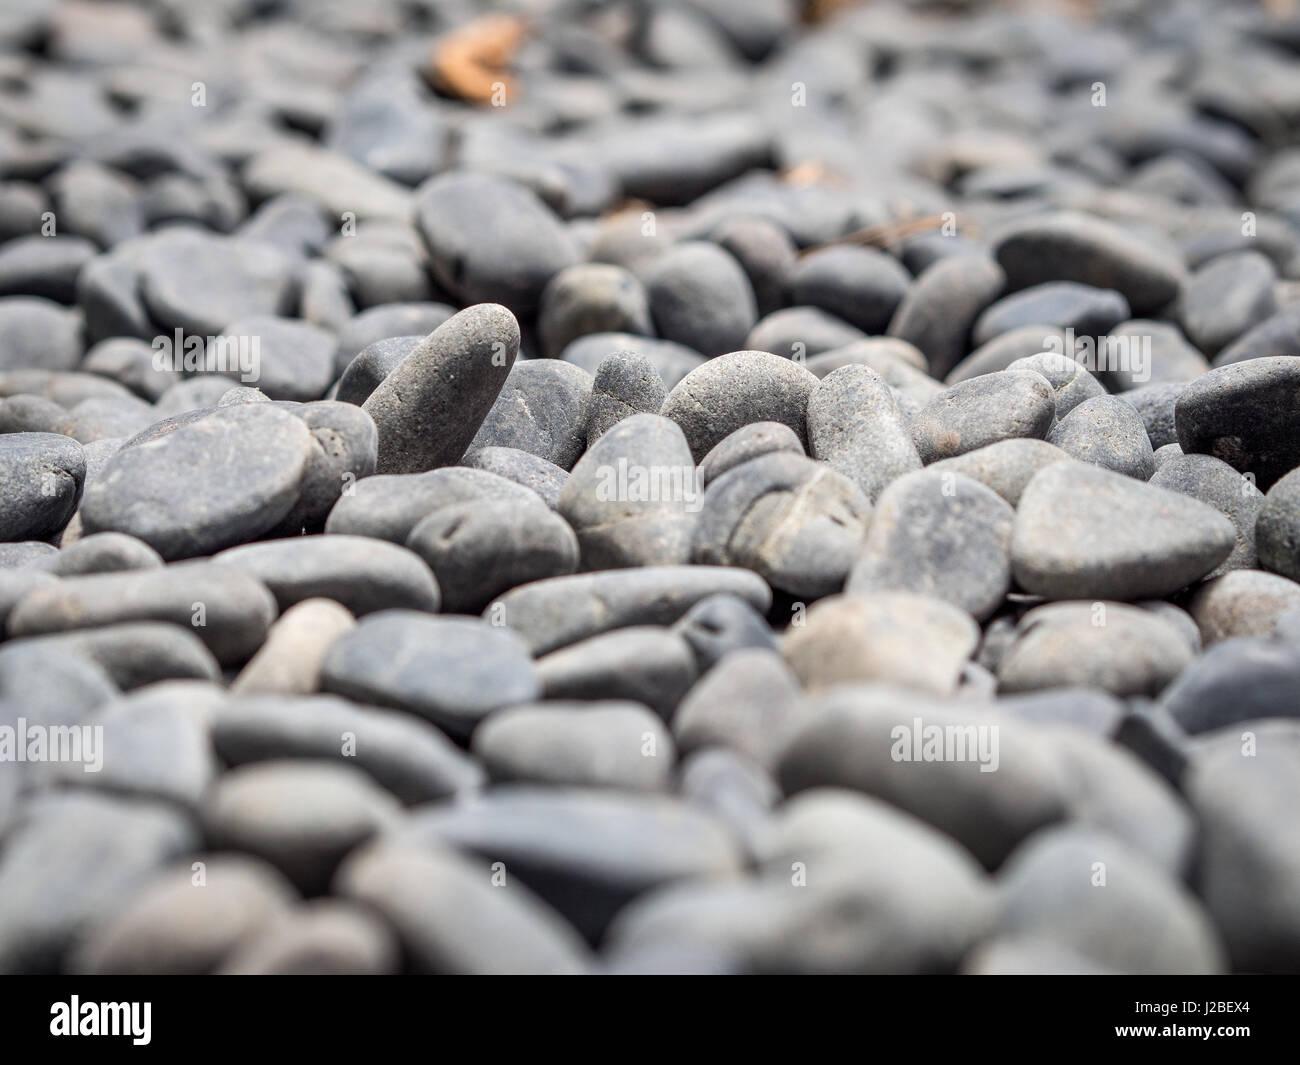 Gravel Pebbles - Stock Image